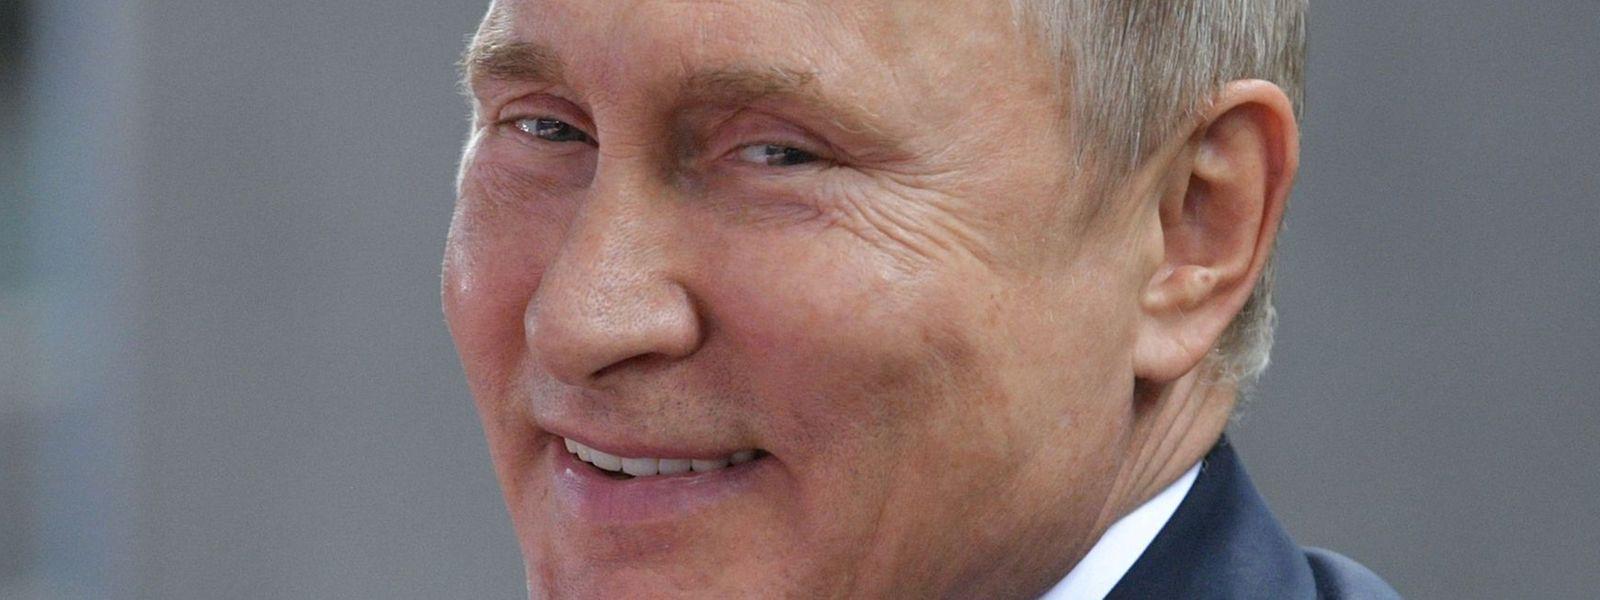 Beliebter als Trump: Wladimir Putin.